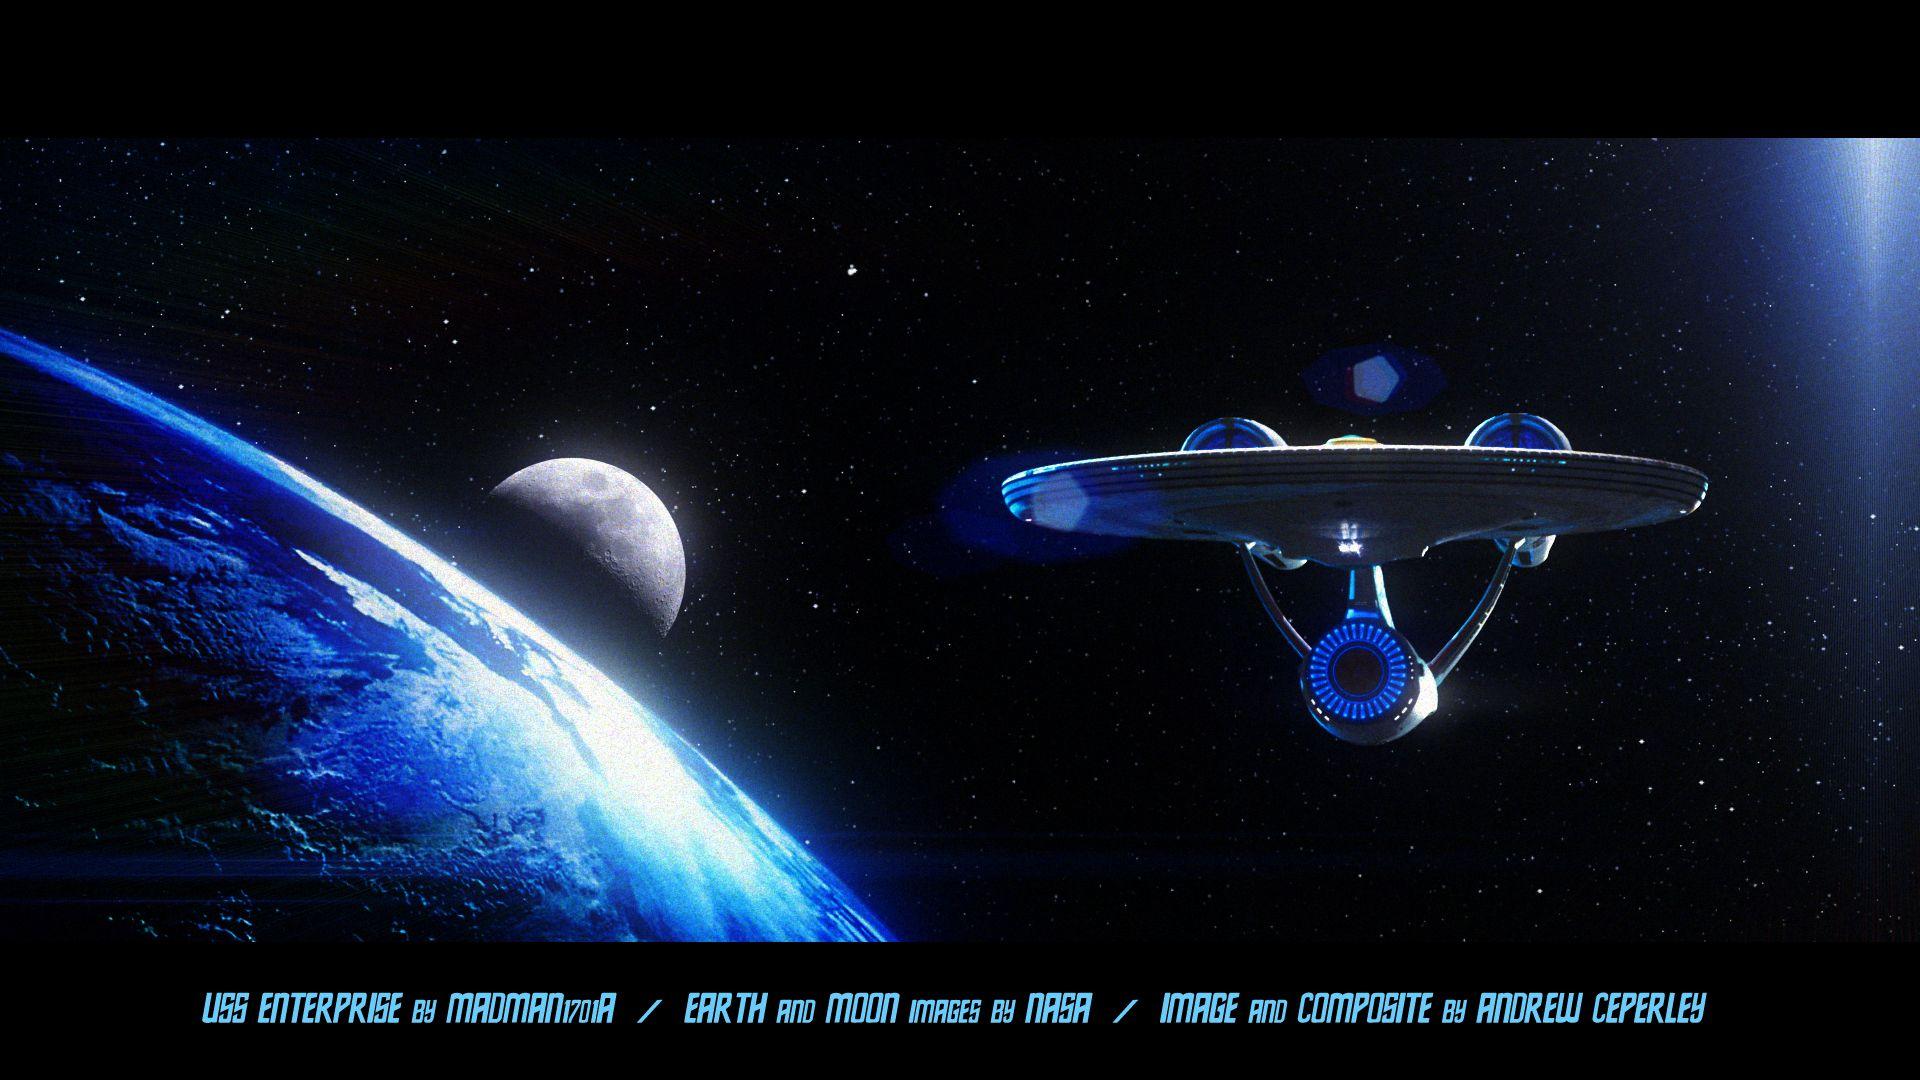 Bien-aimé J.J. Abrams' U.S.S. Enterprise NCC-1701 | Star Trek - U.S.S.  WJ28